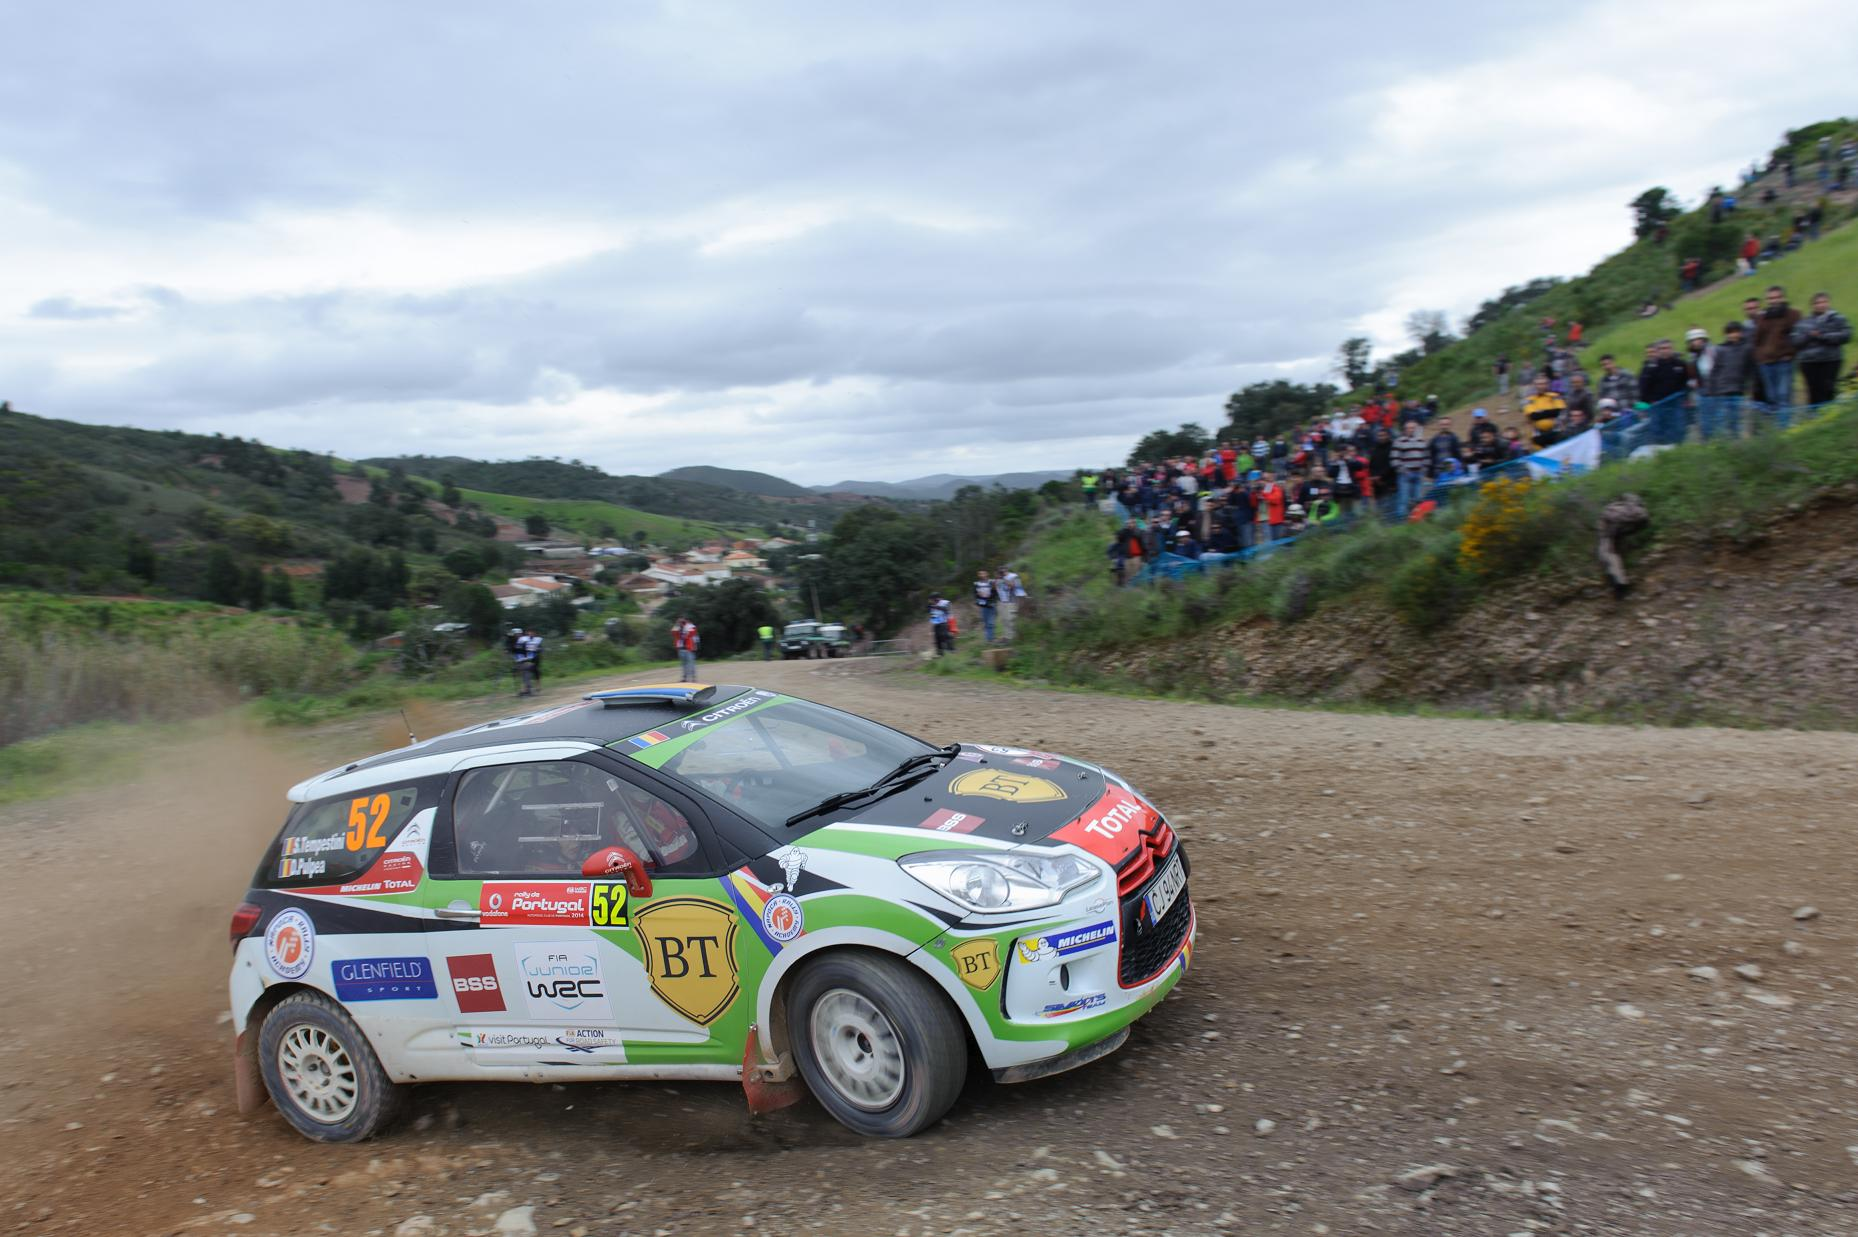 Simone Tempestini, acomodarea cu noua masina continua in Portugalia